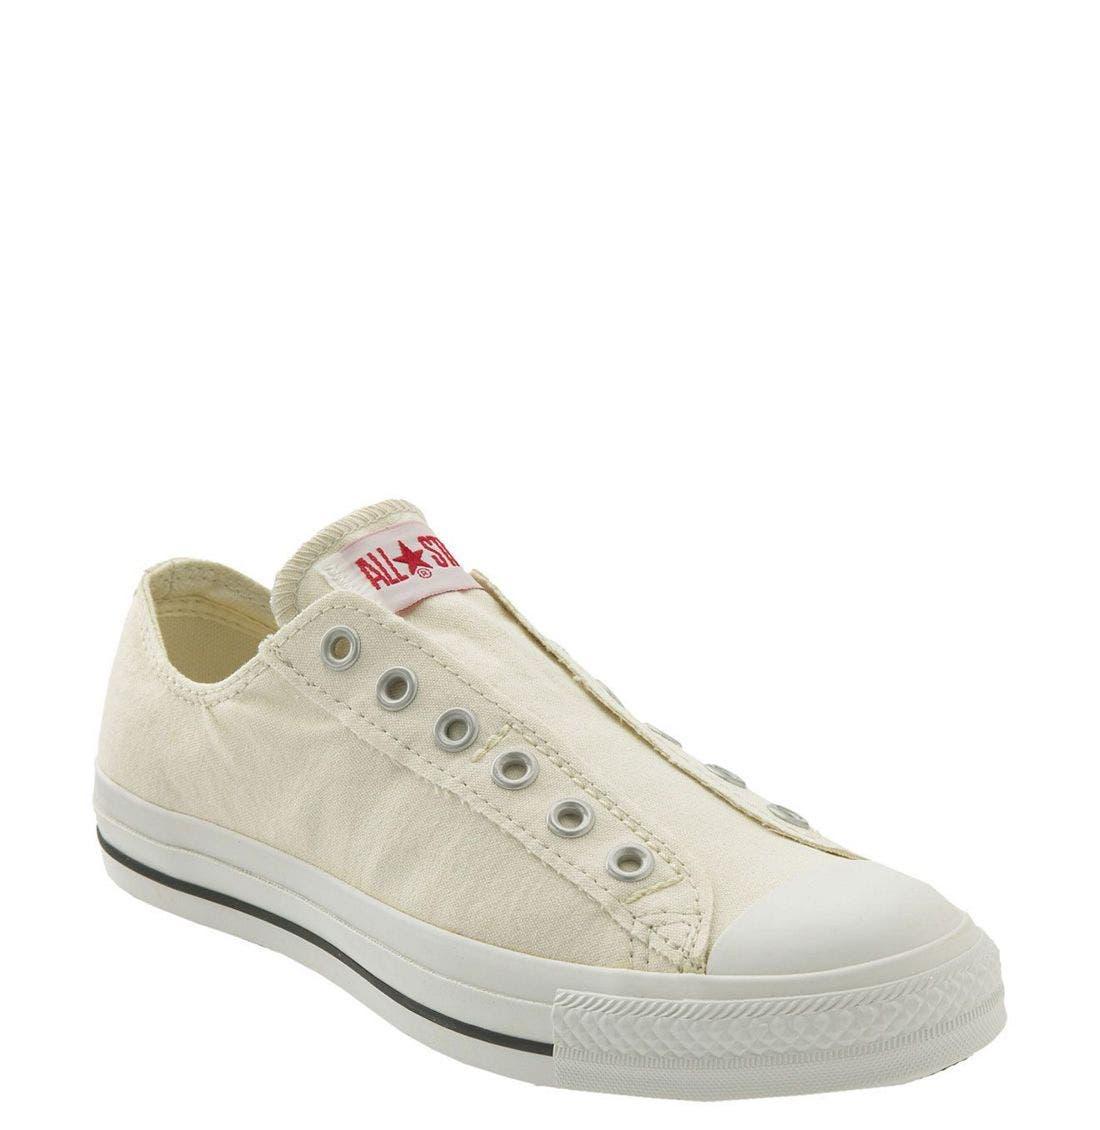 Alternate Image 1 Selected - Converse Chuck Taylor® Low Slip-On Sneaker (Women)